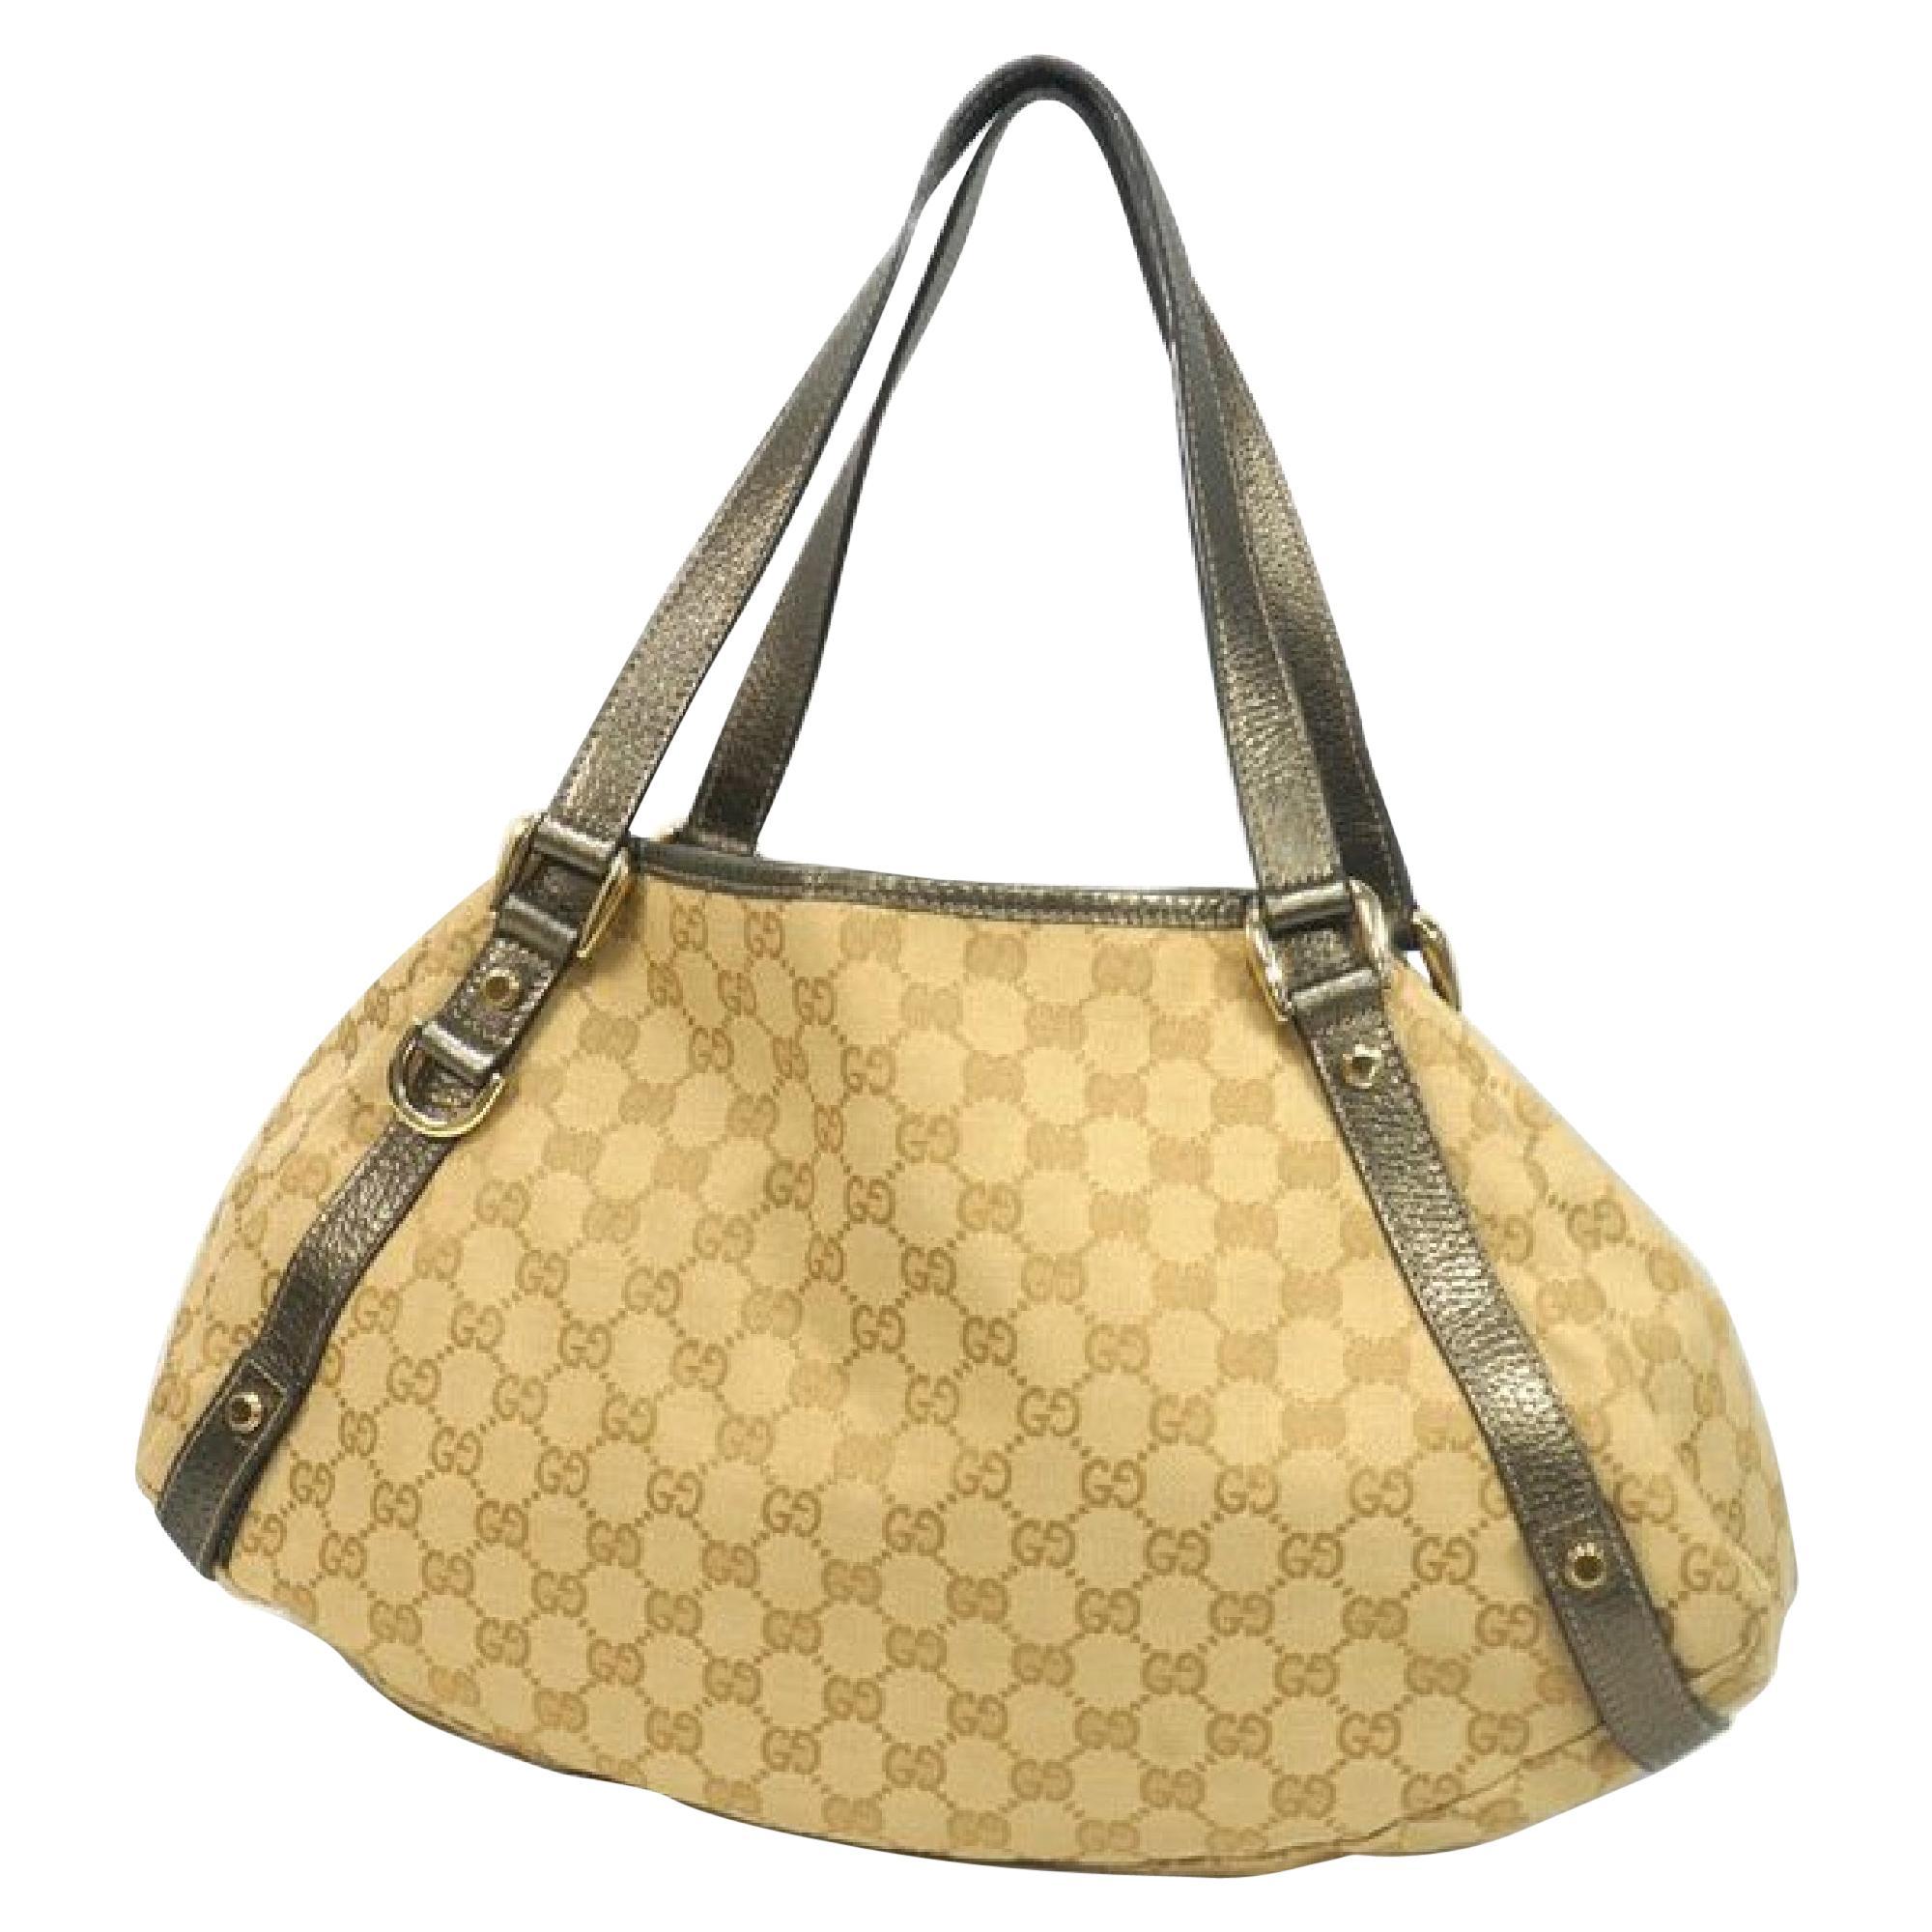 GUCCI Womens shoulder bag 130736 002122 beige x metallic khaki